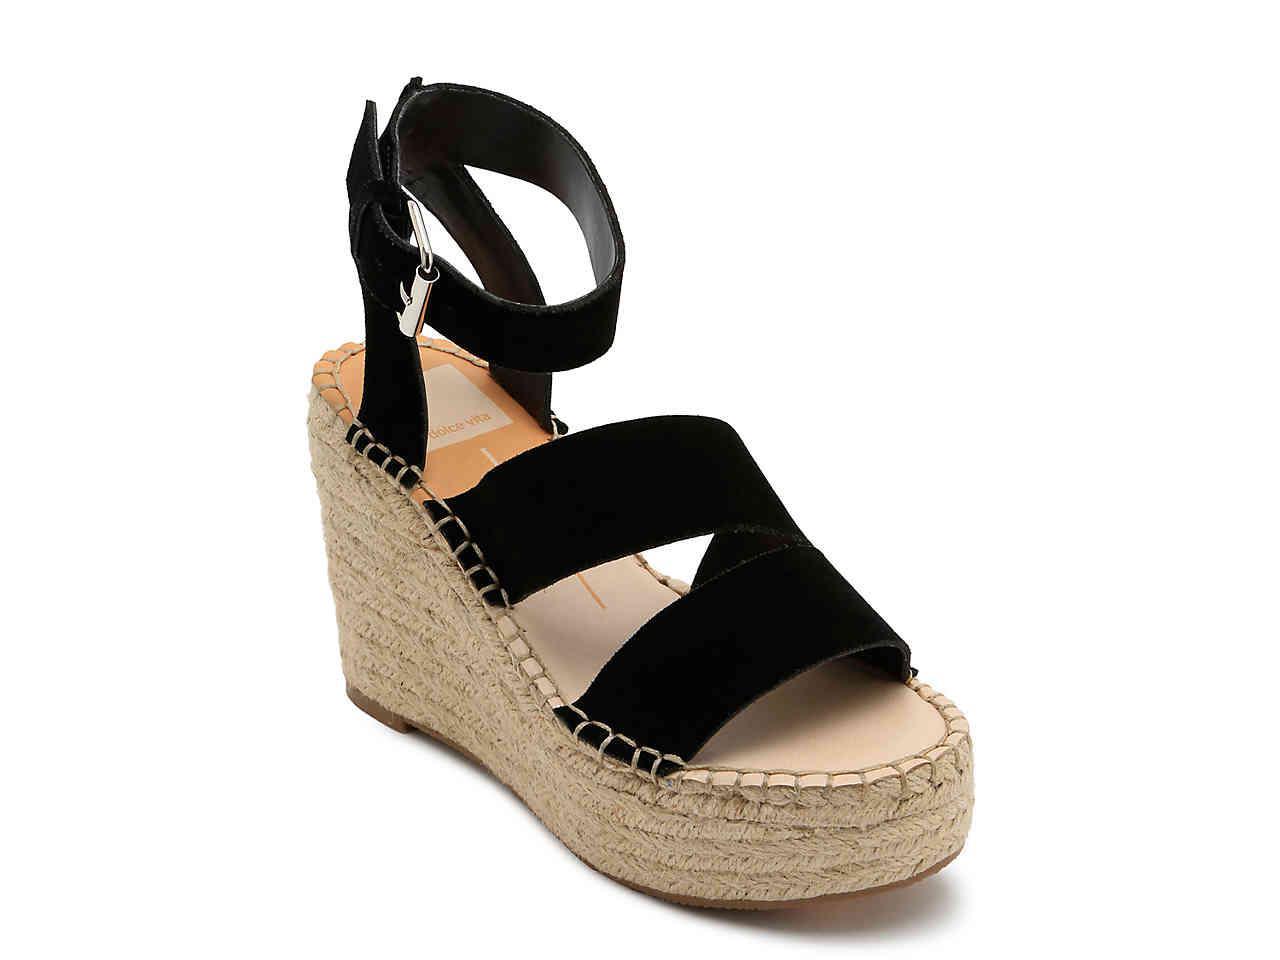 e4cf5b142b5 Dolce Vita - Black Shayla Espadrille Wedge Sandal - Lyst. View fullscreen